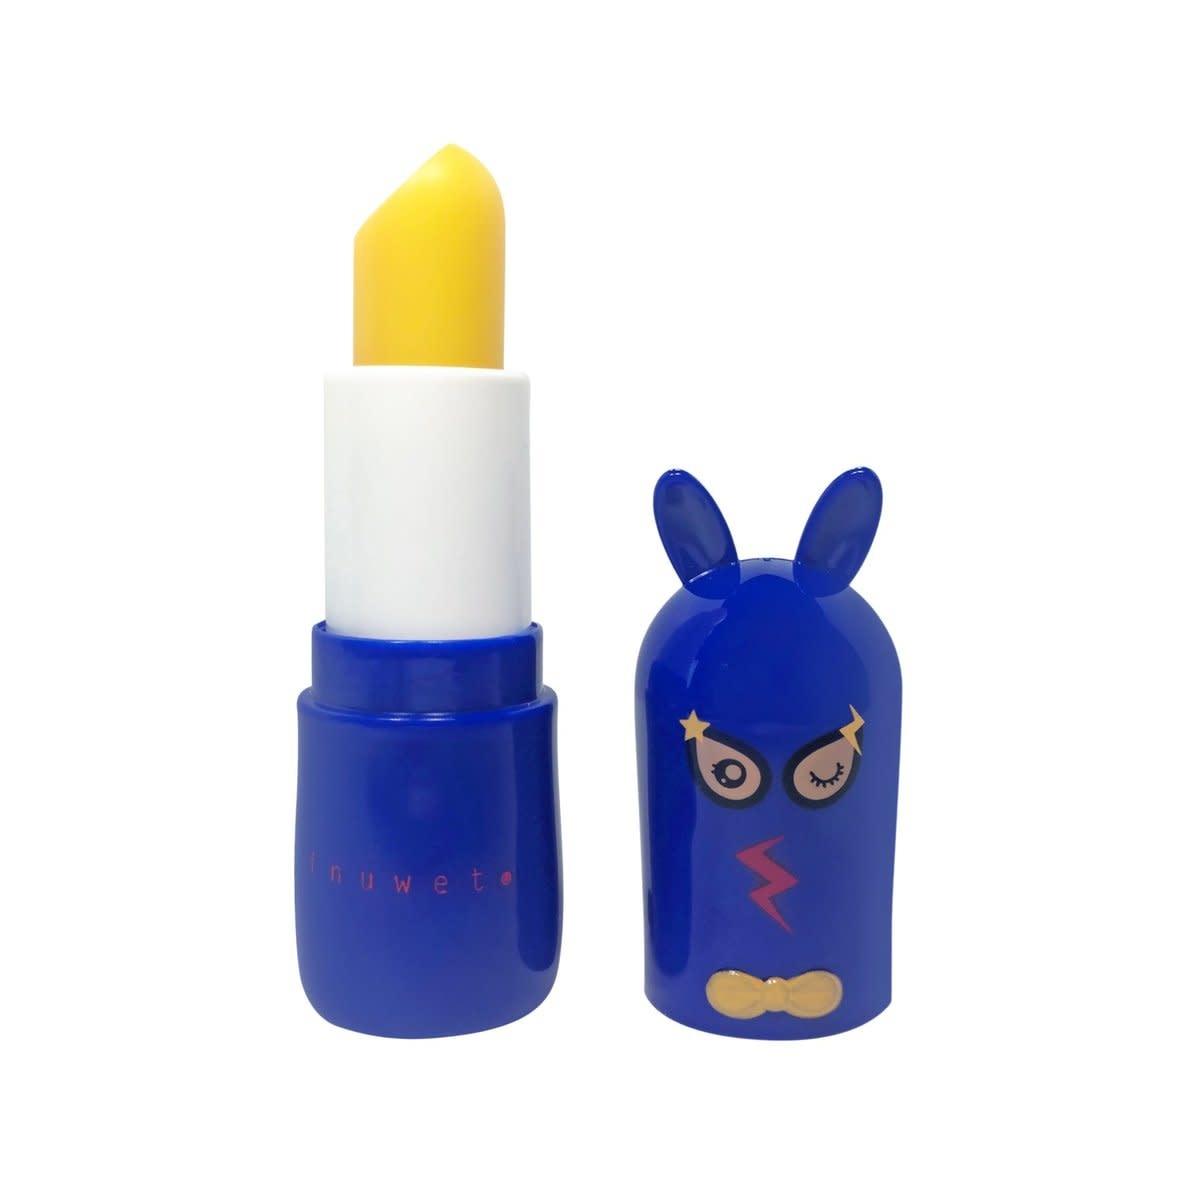 IW Bunny Flash Boy  - kiwi